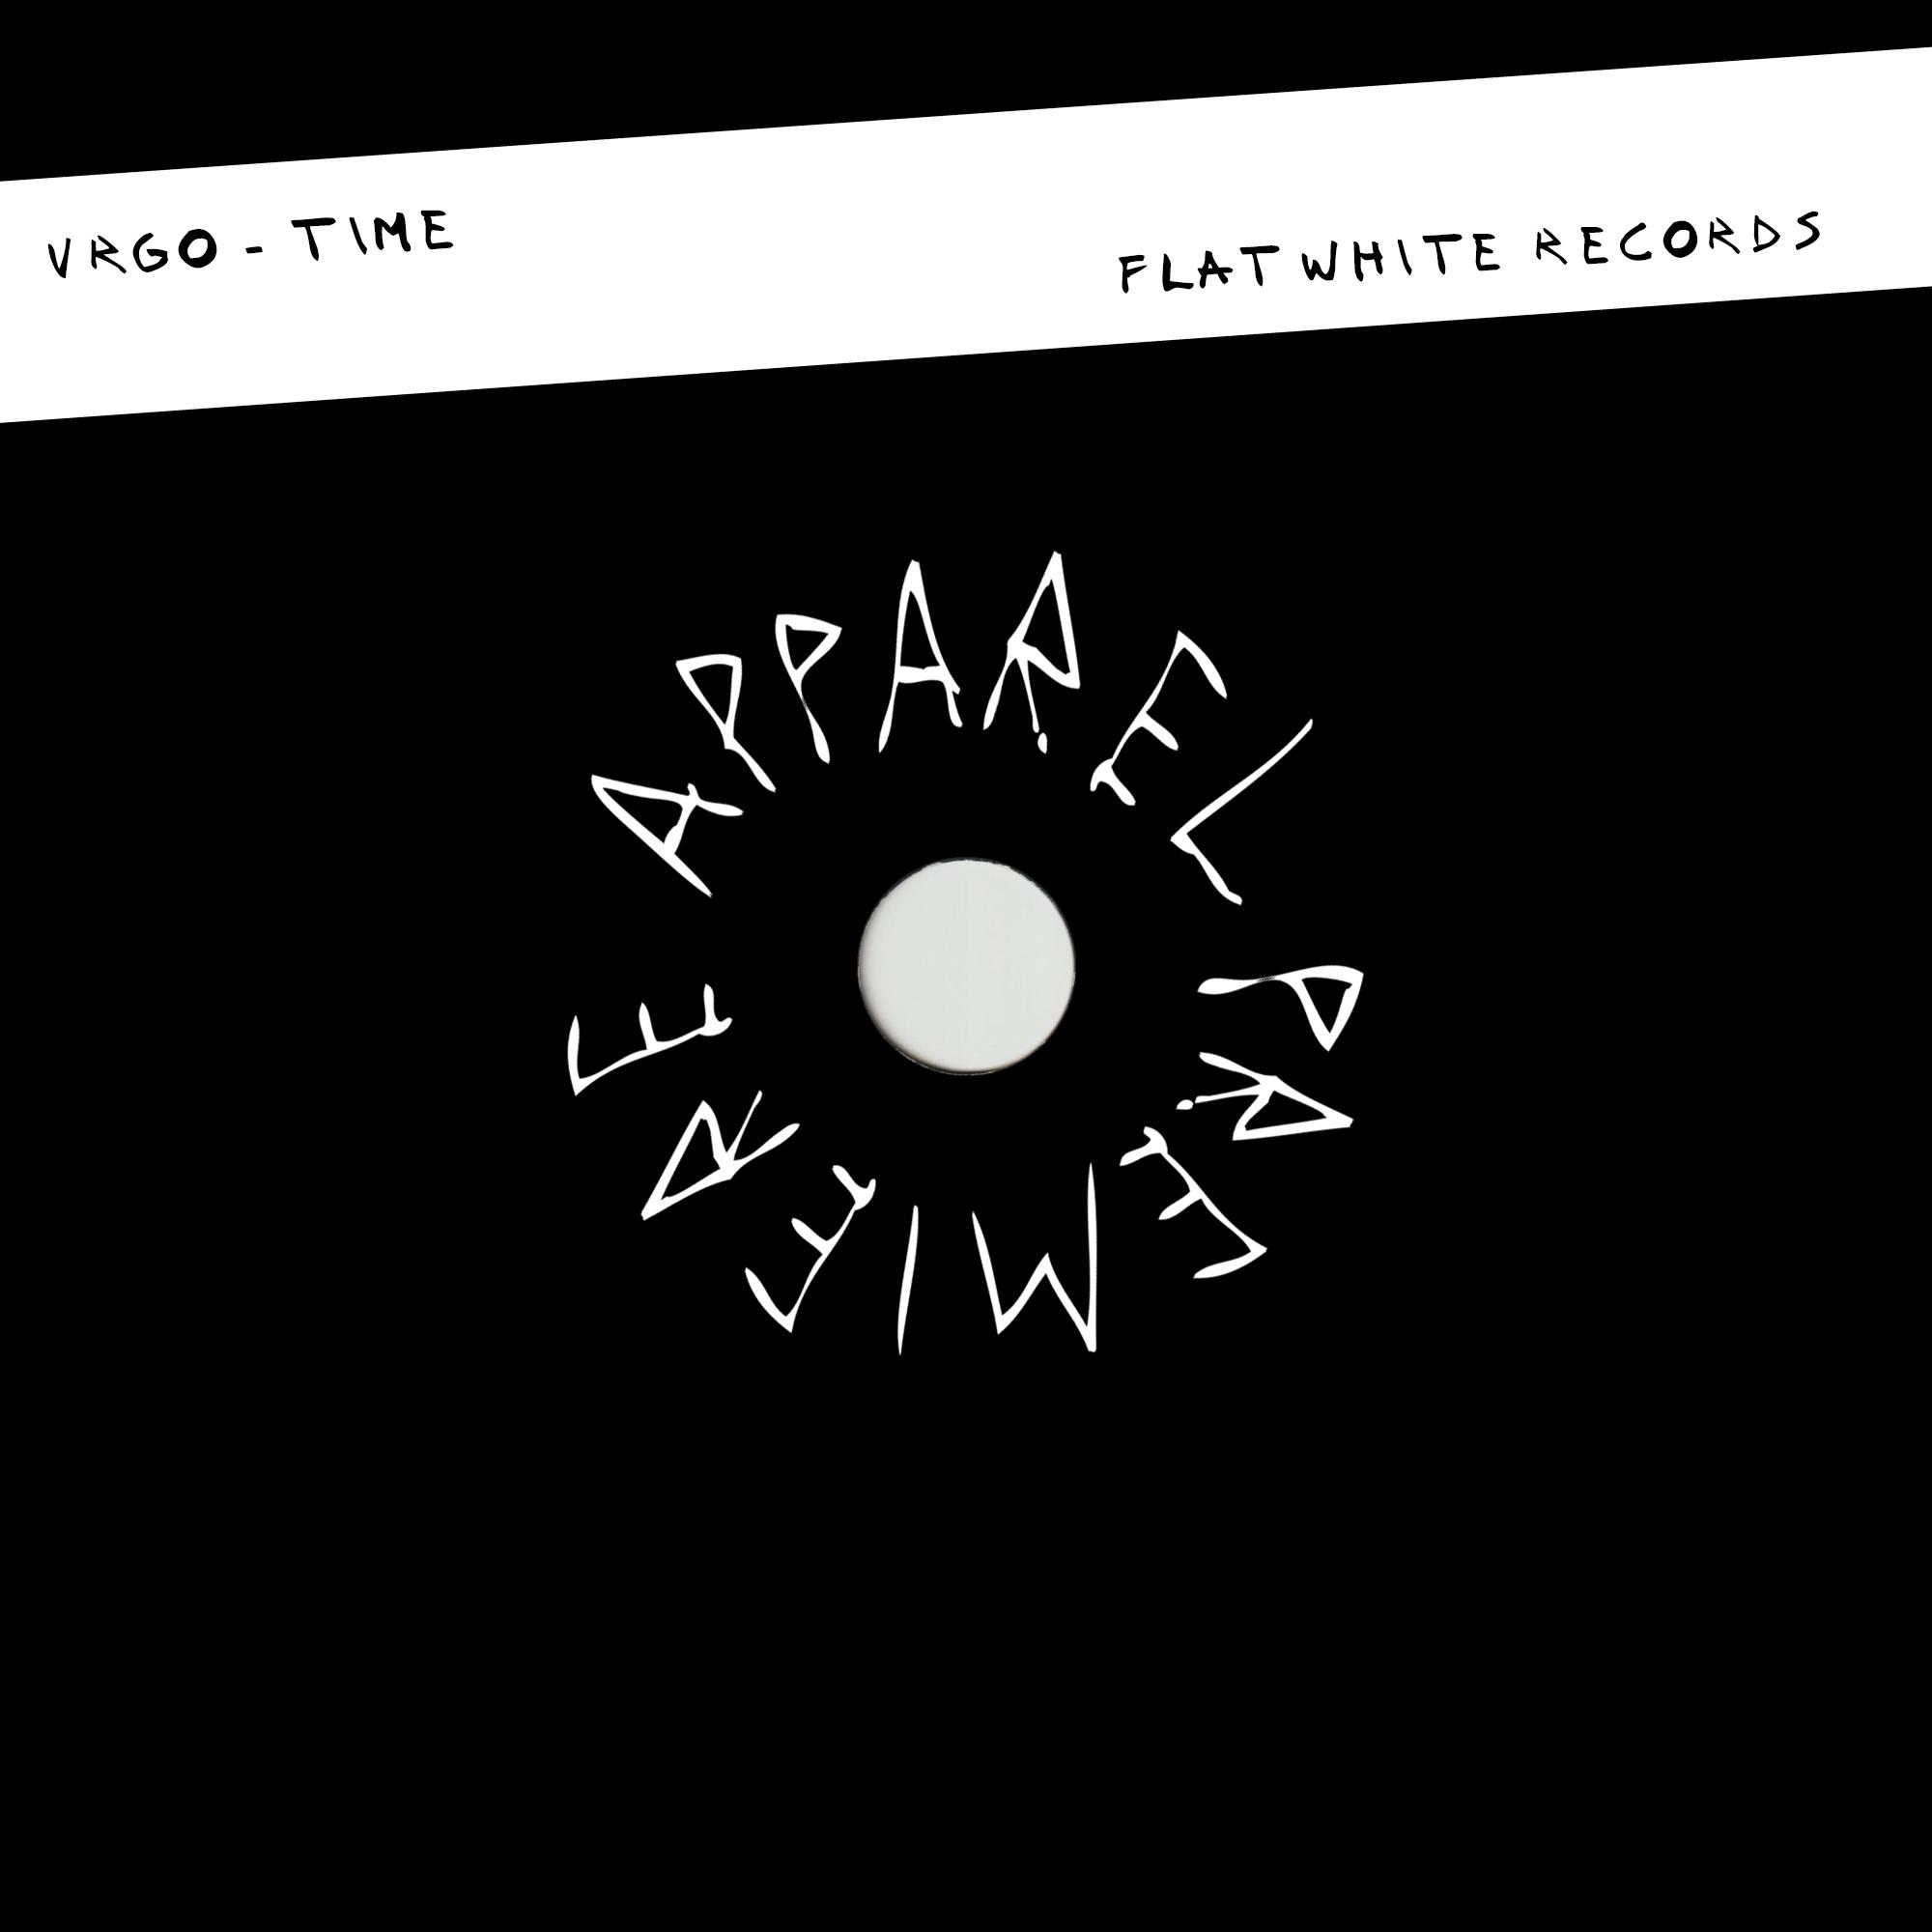 APPAREL PREMIERE VRGO Flat White Records